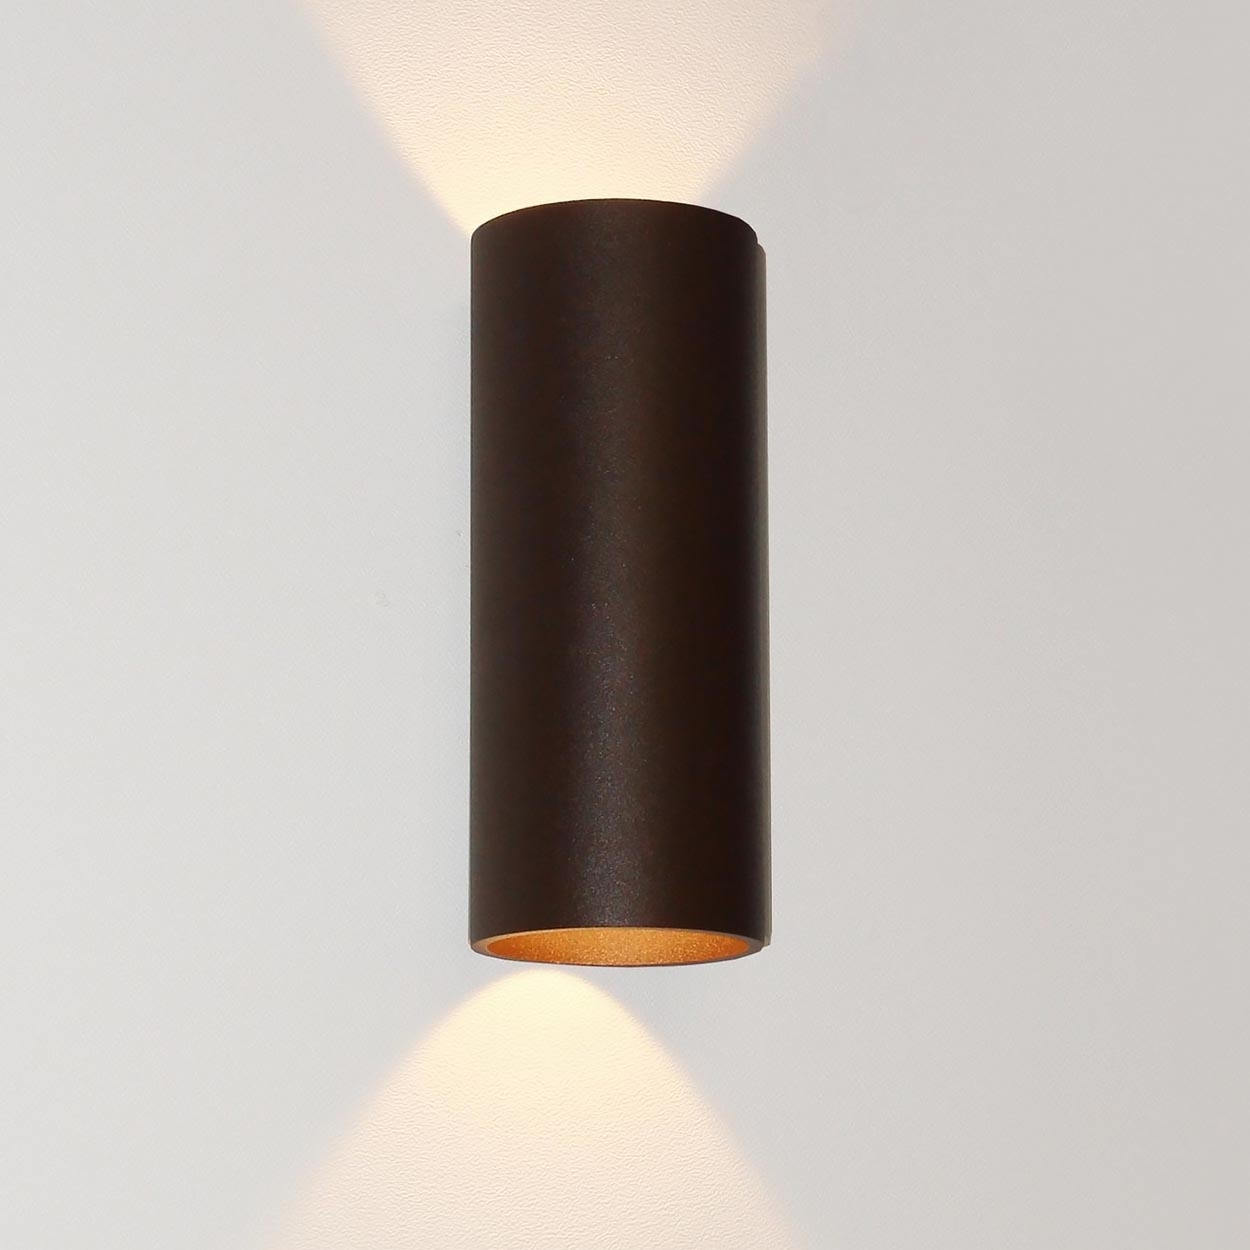 Artdelight Wandlamp Brody 2 lichts H 18 cm bruin